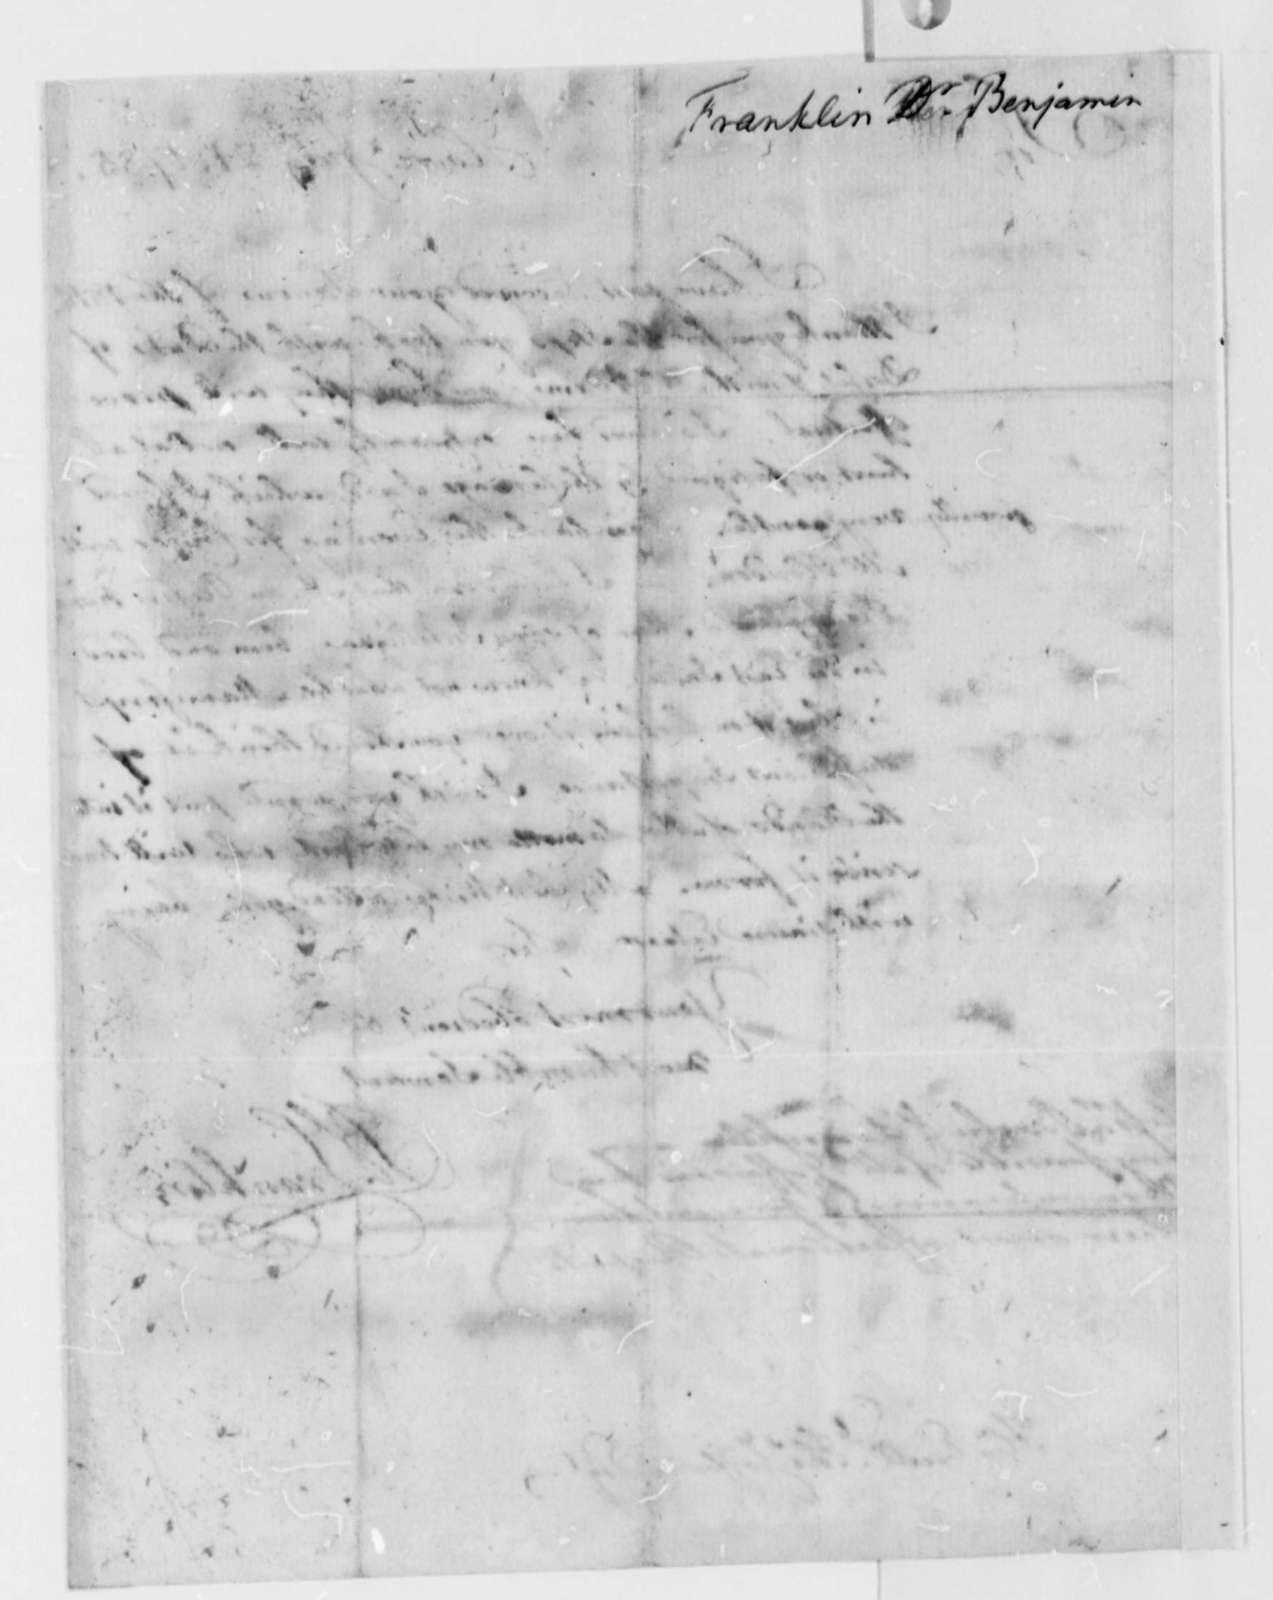 Benjamin Franklin to Thomas Jefferson, July 21, 1785